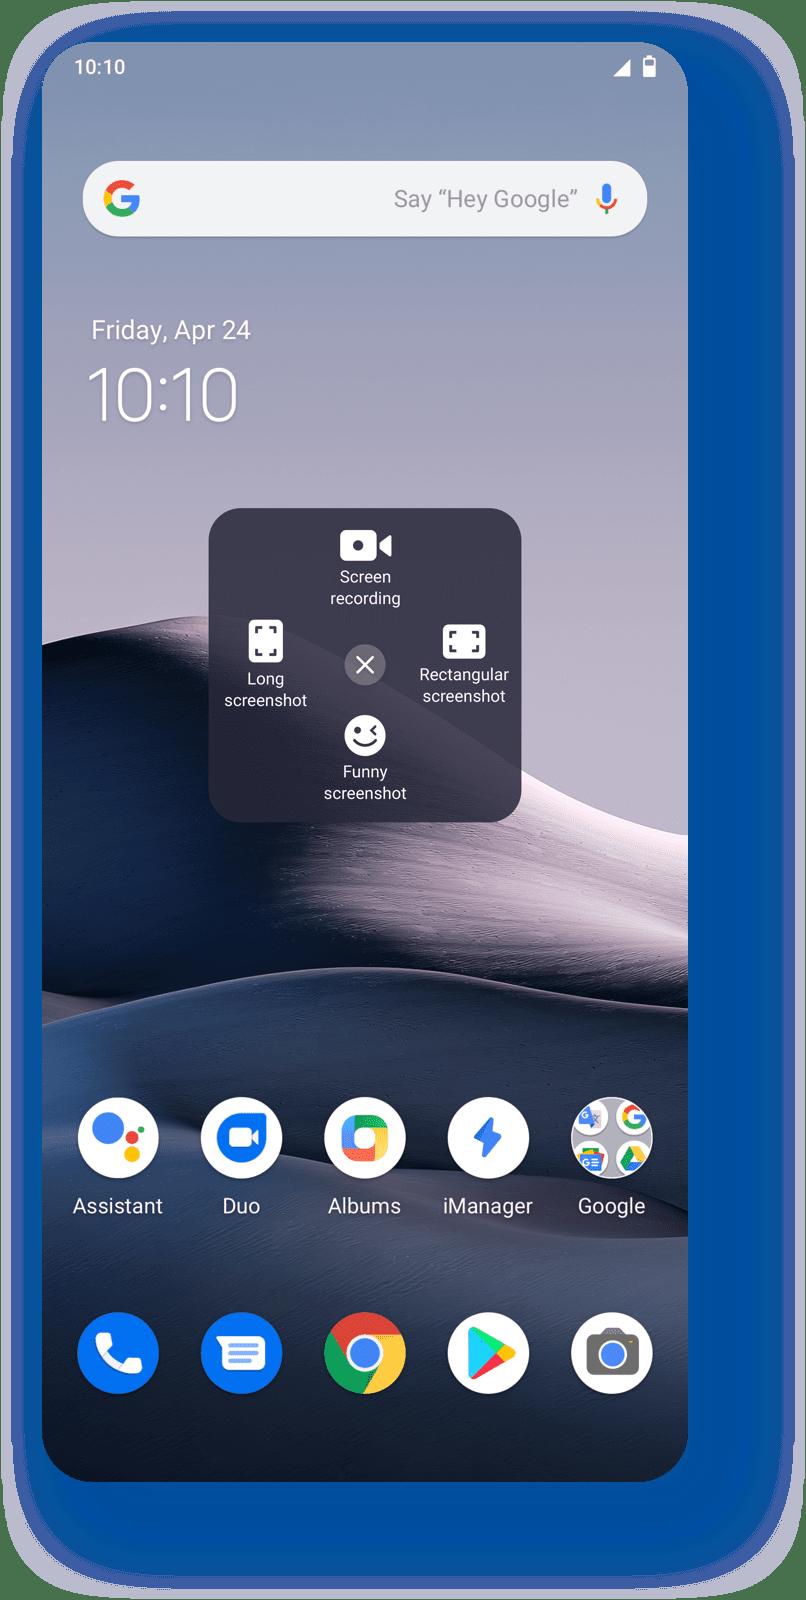 fos11 s10 phone lg.48e2430 | TechBuyGuide